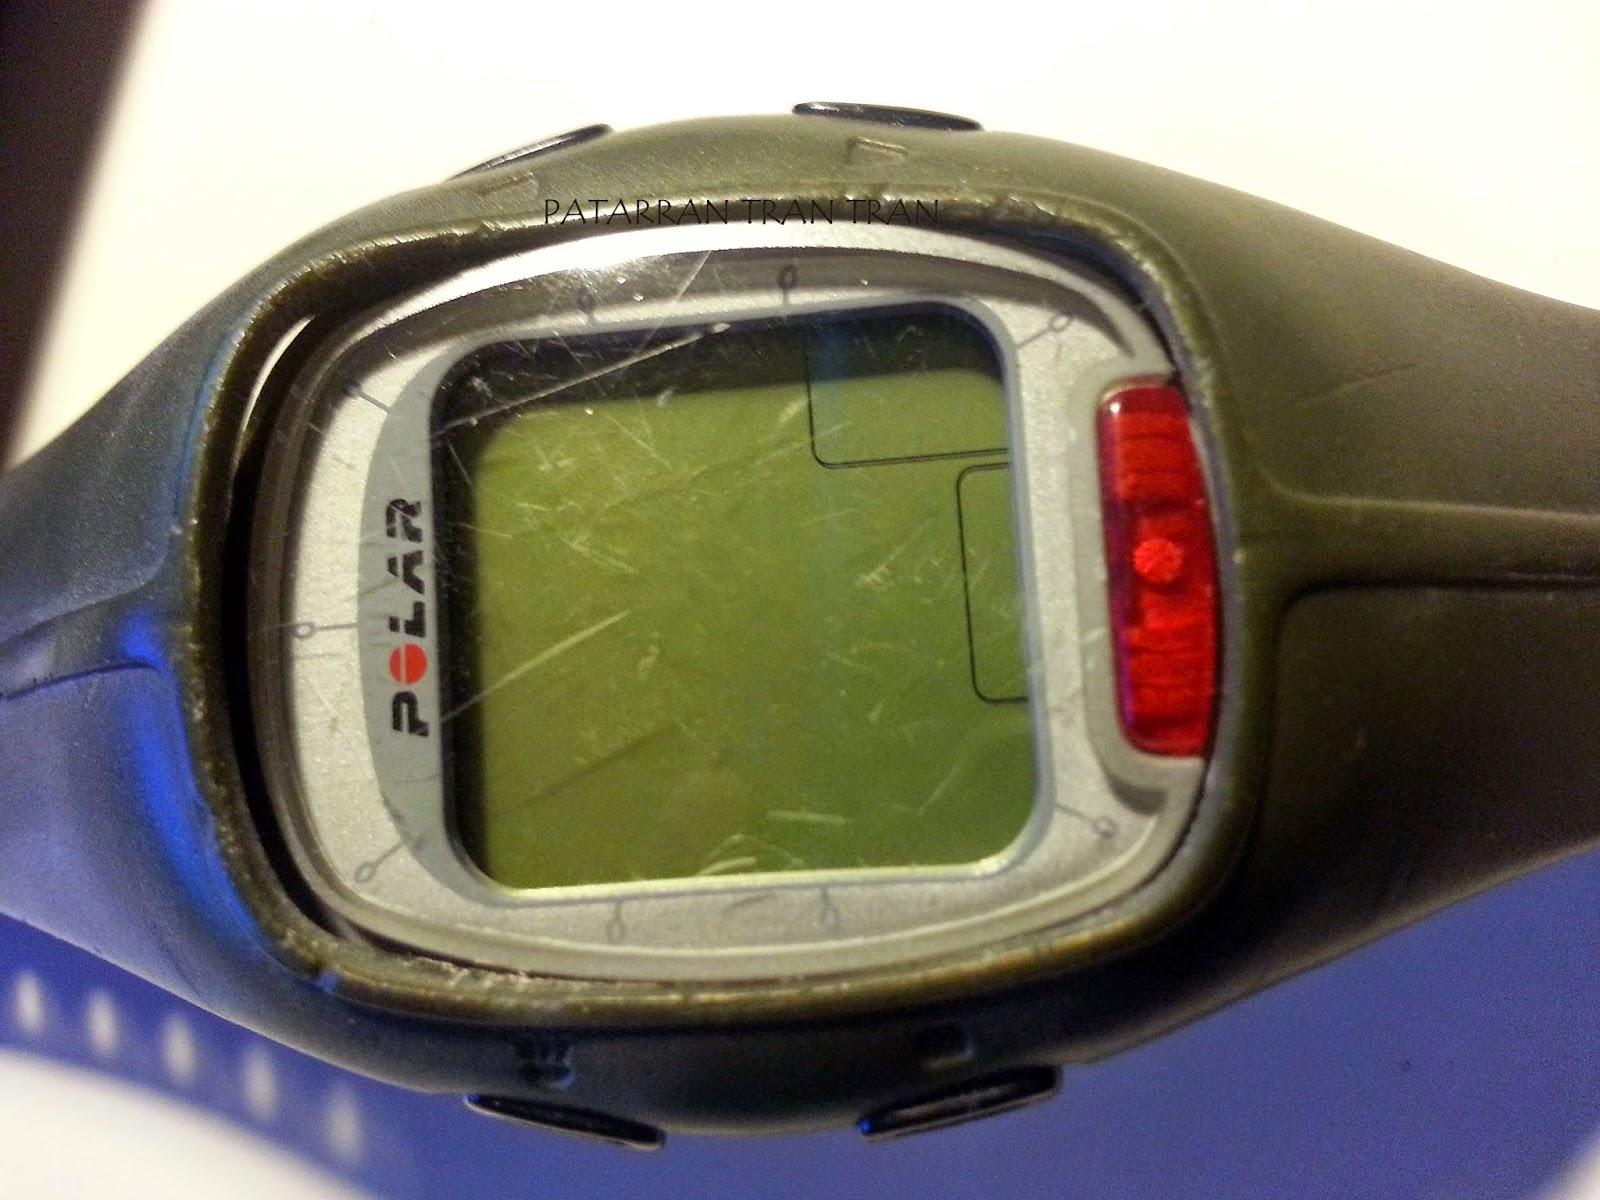 Pulsometro Polar RS100